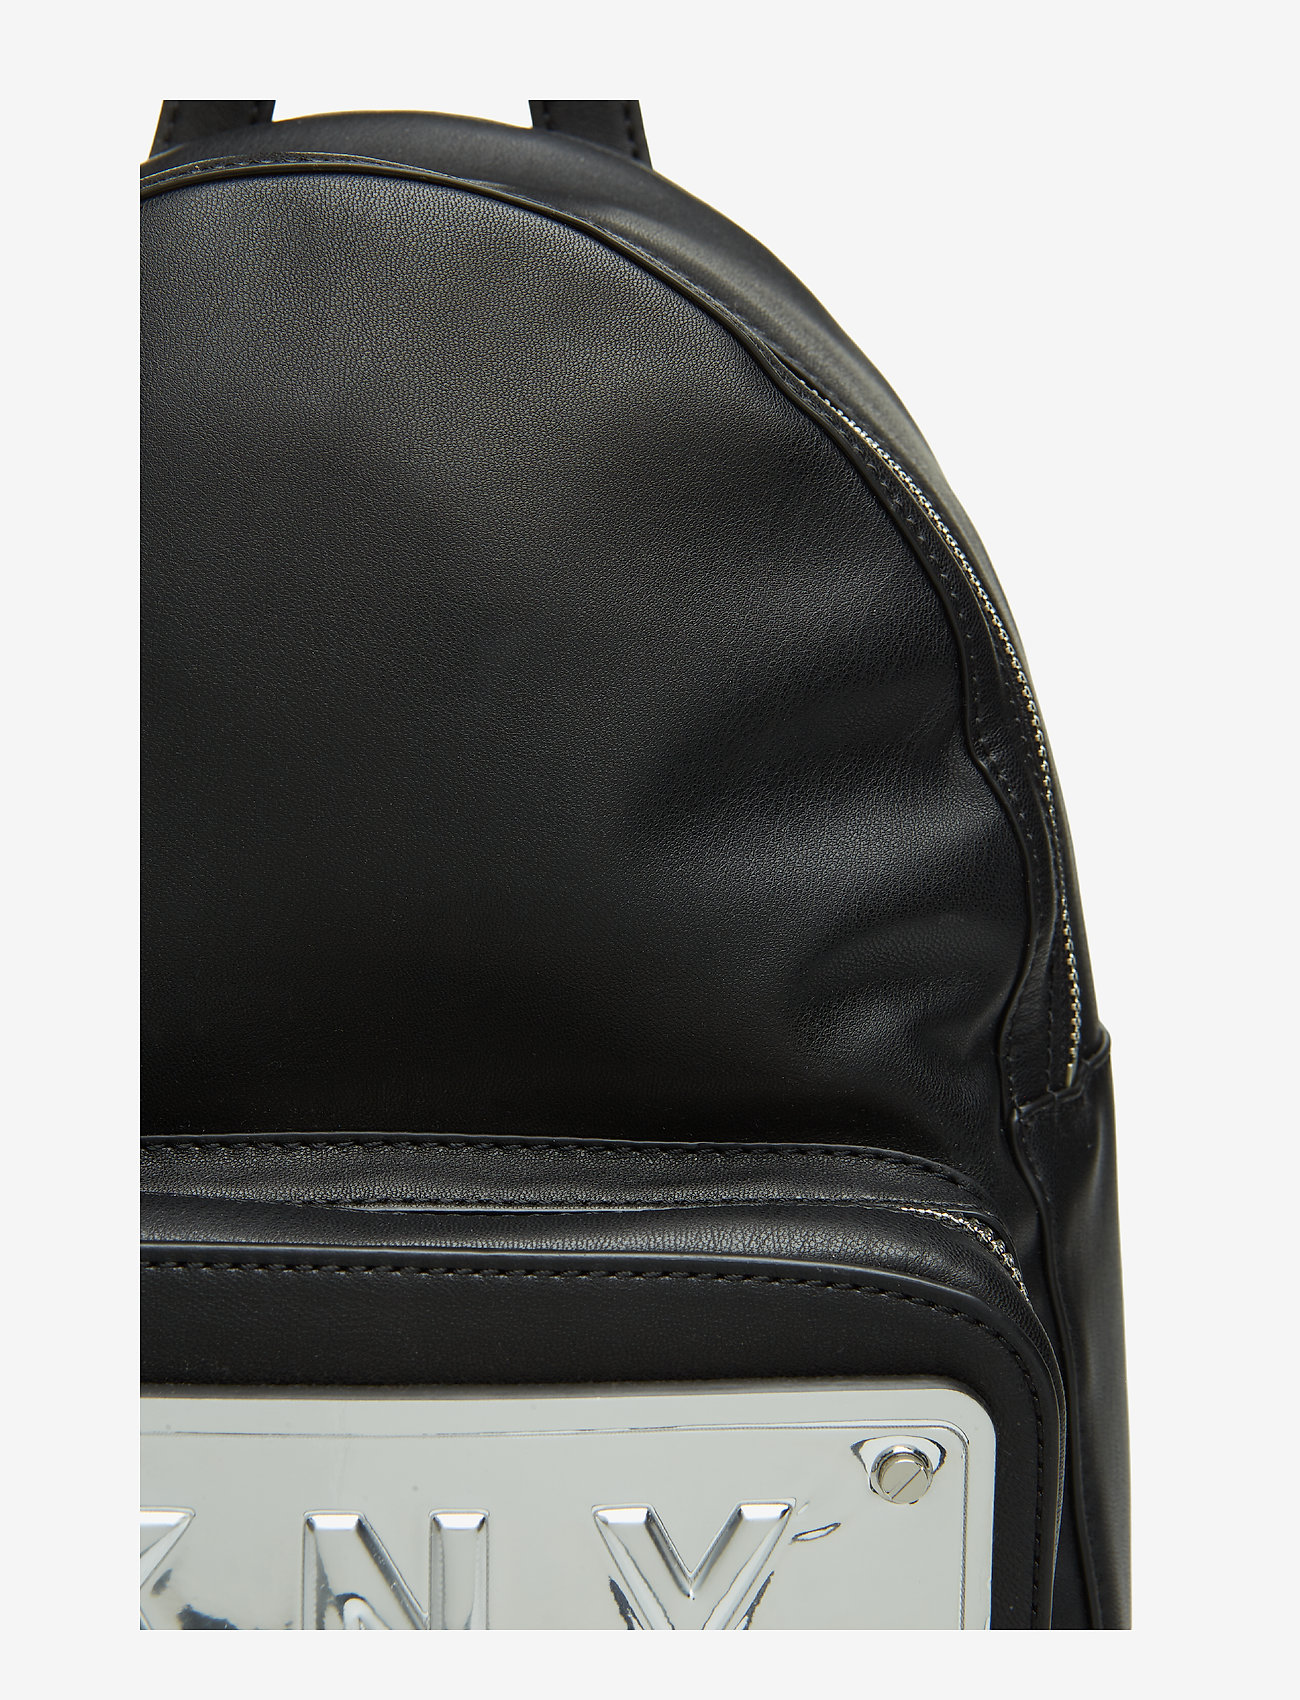 10018 Pu (Black/silver) (138.60 €) - DKNY Bags wmTAK